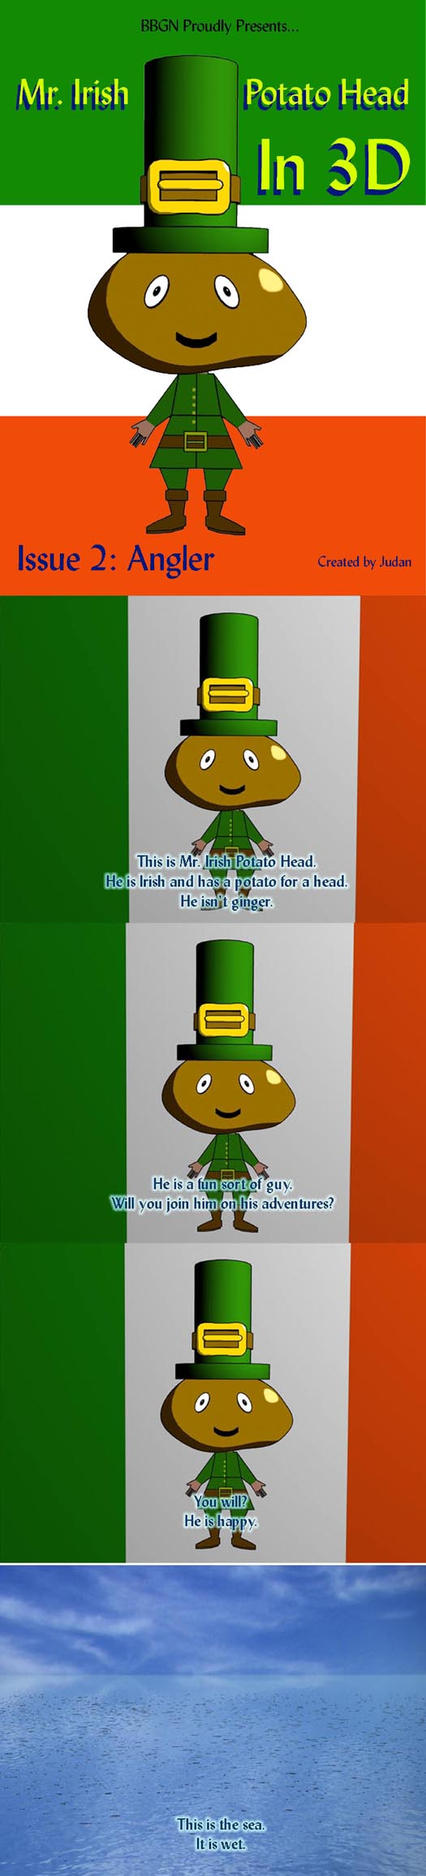 Mr. Irish Potato Head at Sea by Judan